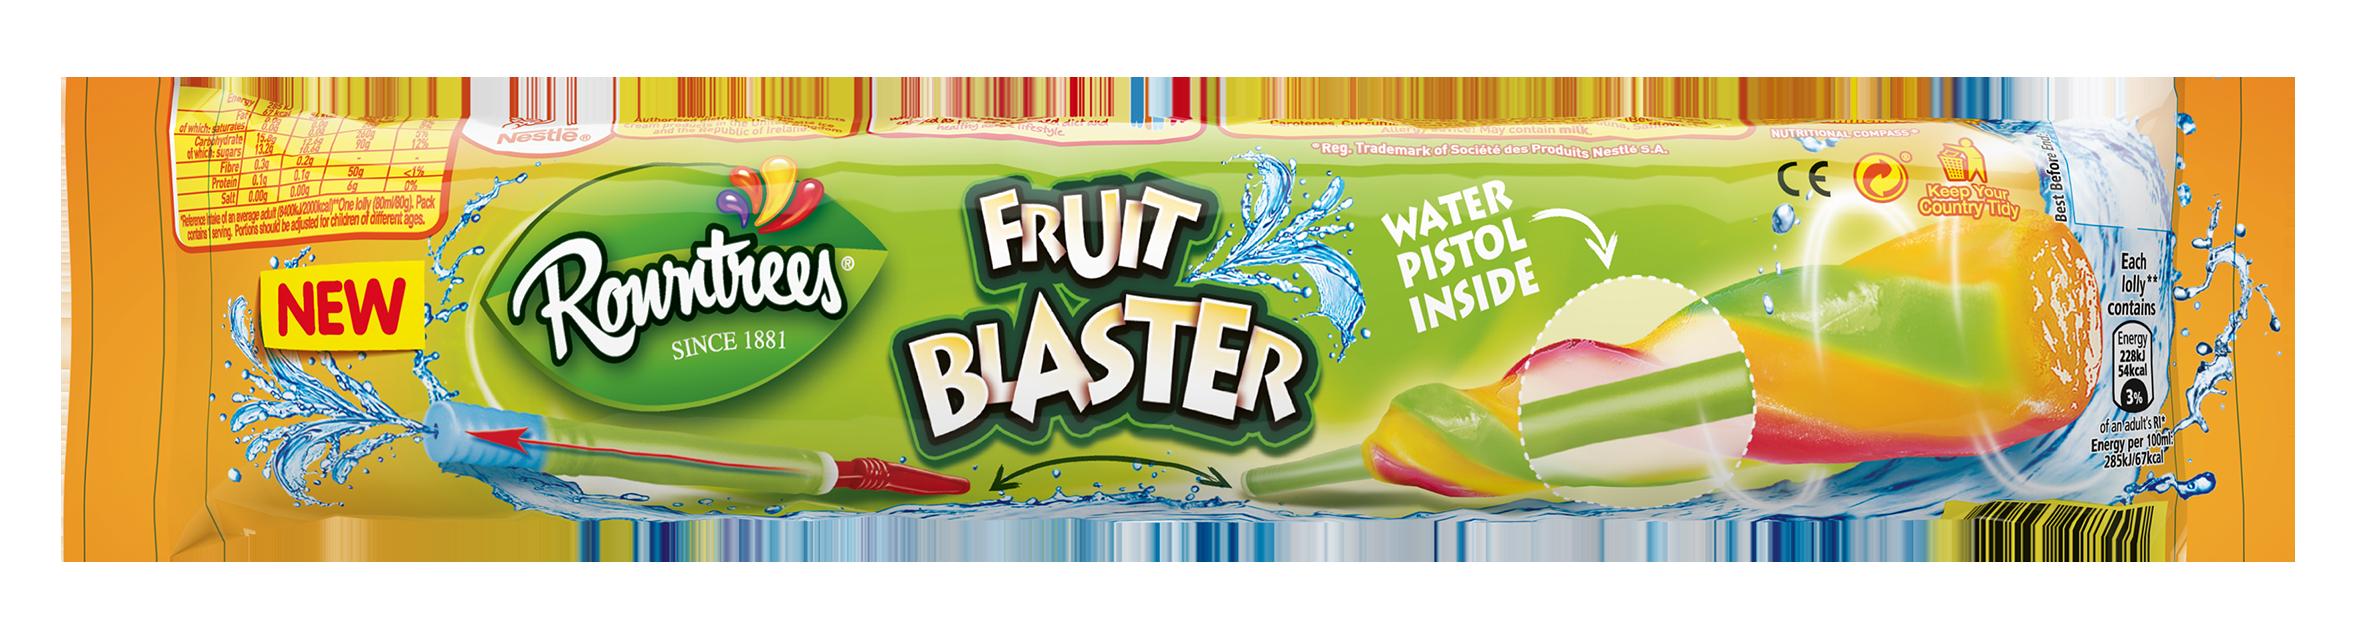 2455 - Rowntrees Fruit Blaster (2) (1).png